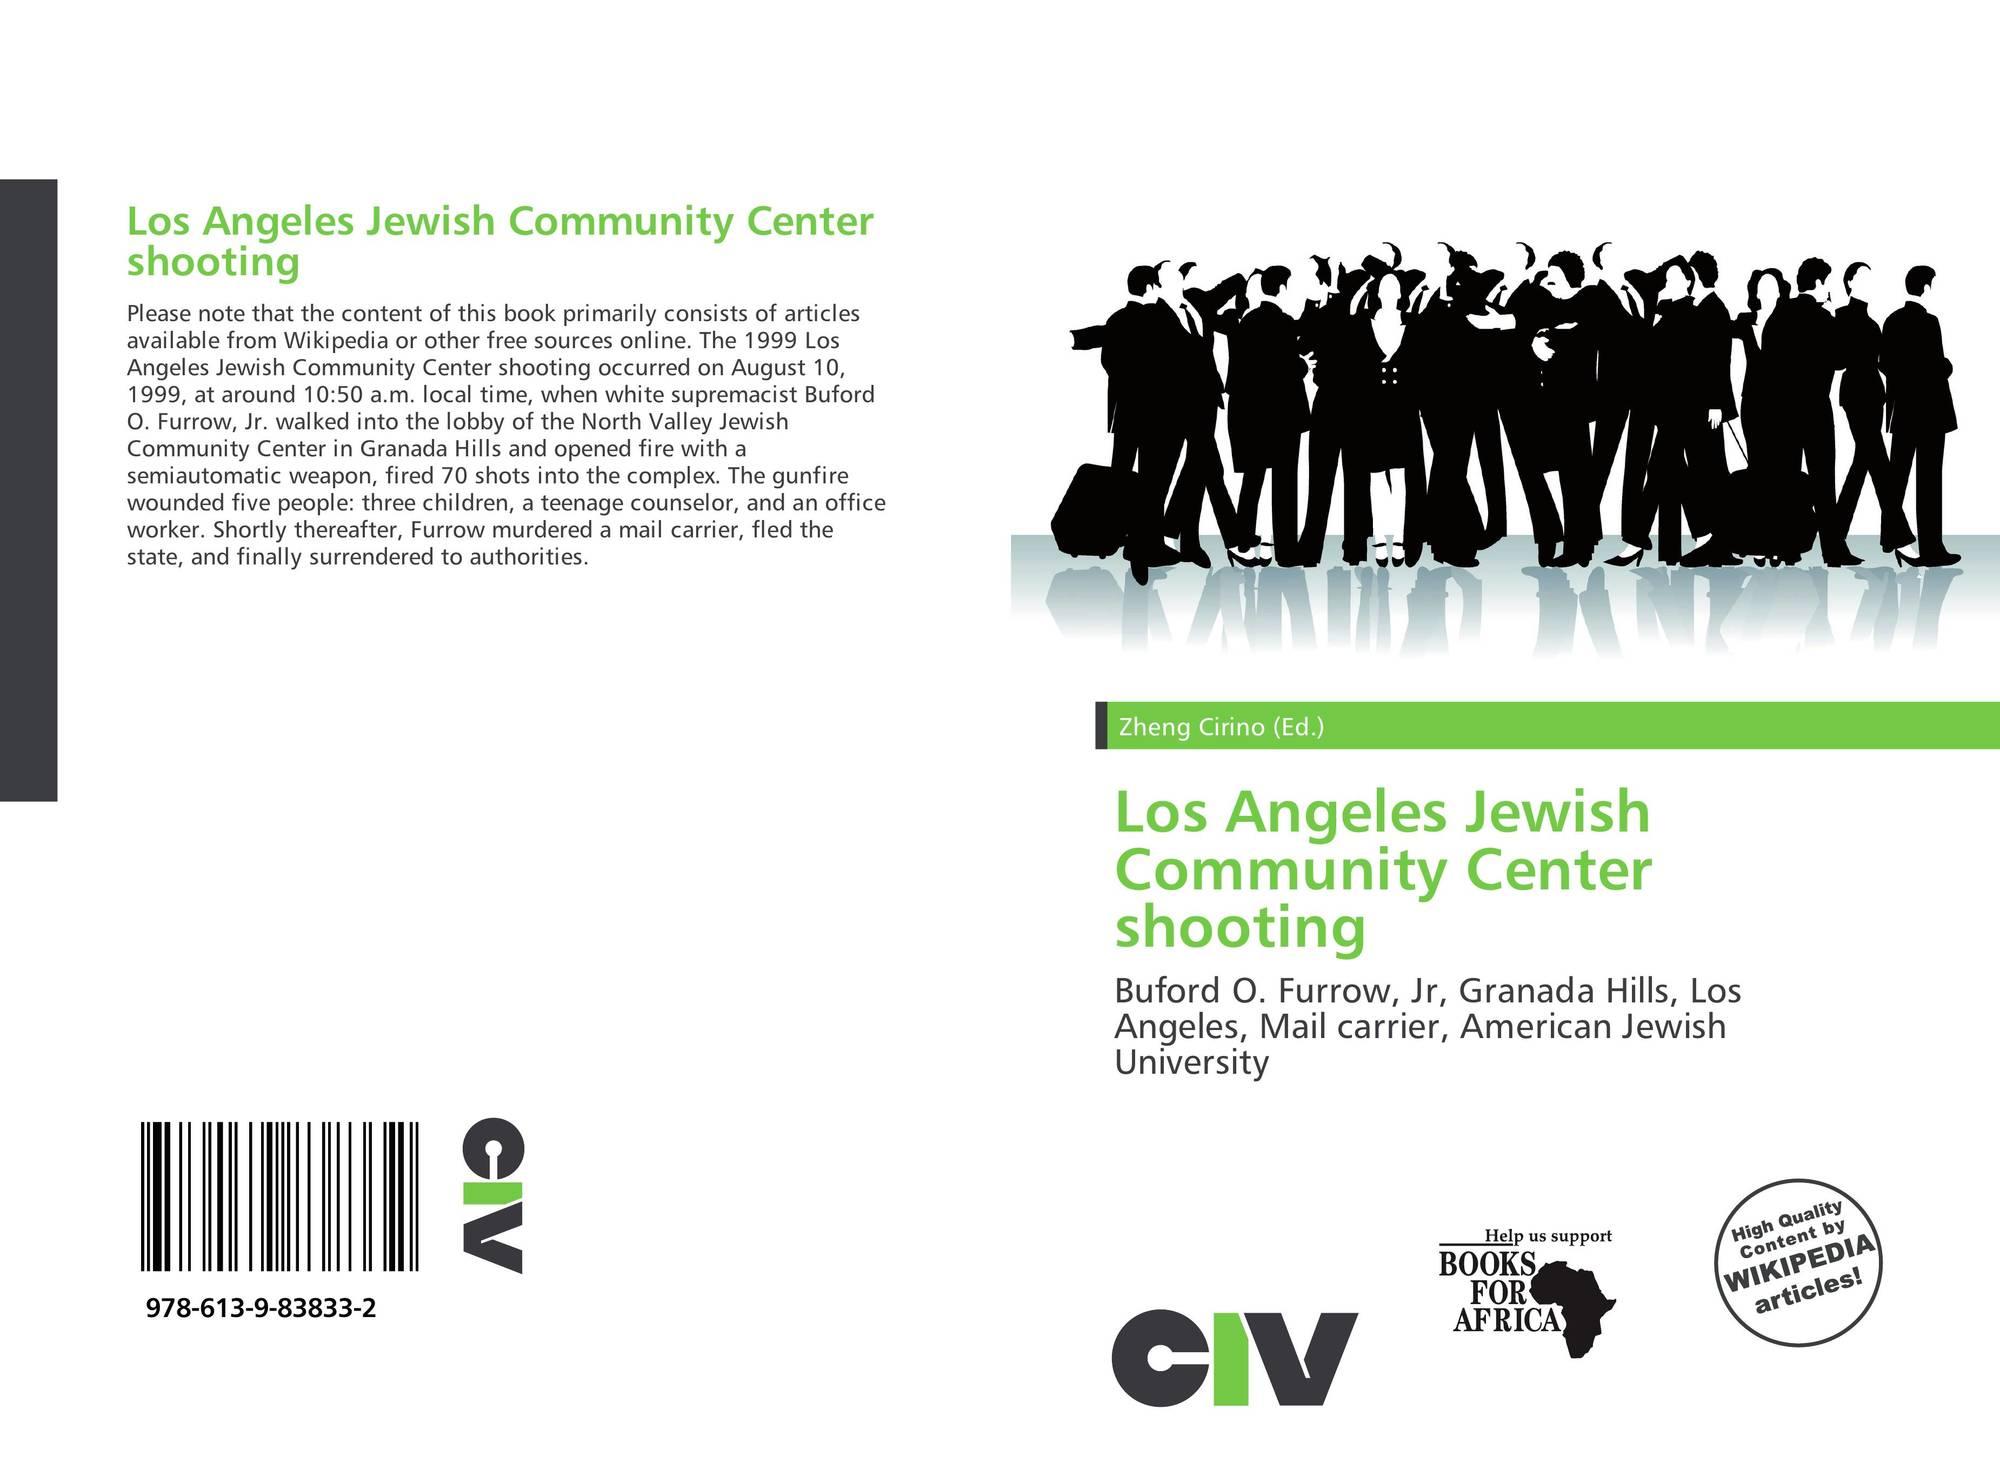 los angeles jewish community center